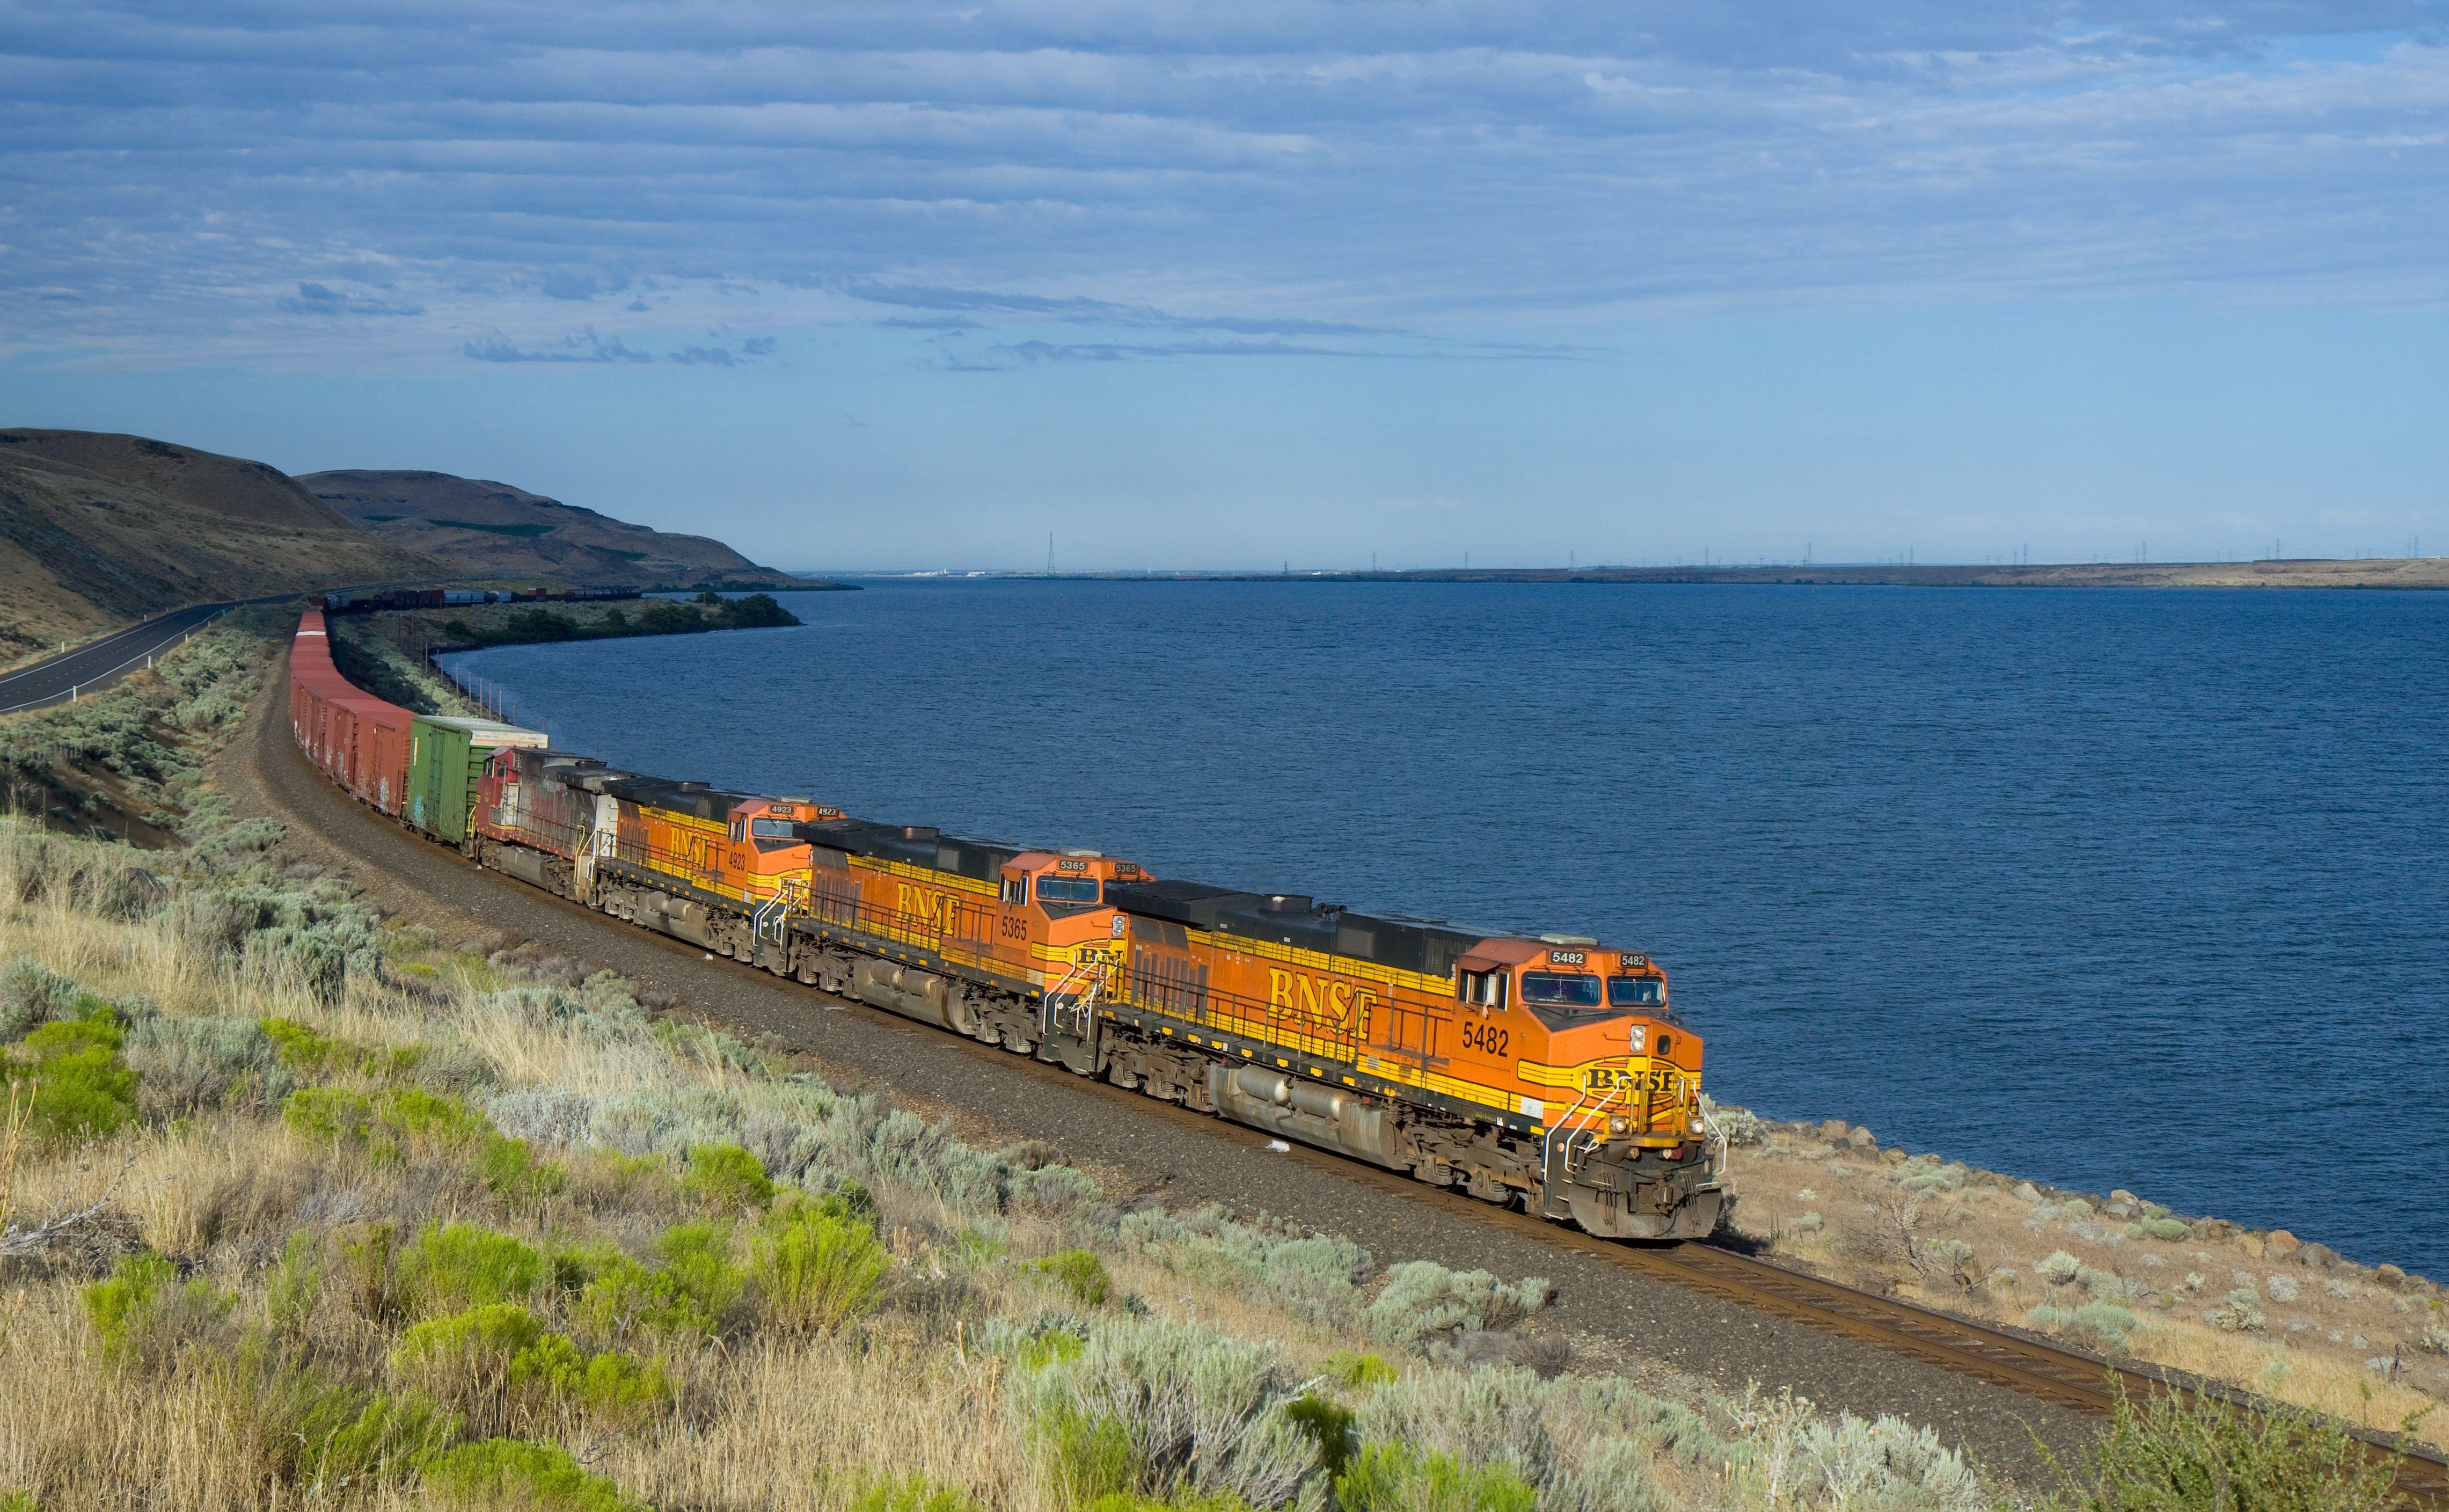 Pin By Martha Vazquez On All Aboard Train Diesel Locomotive Rail Transport